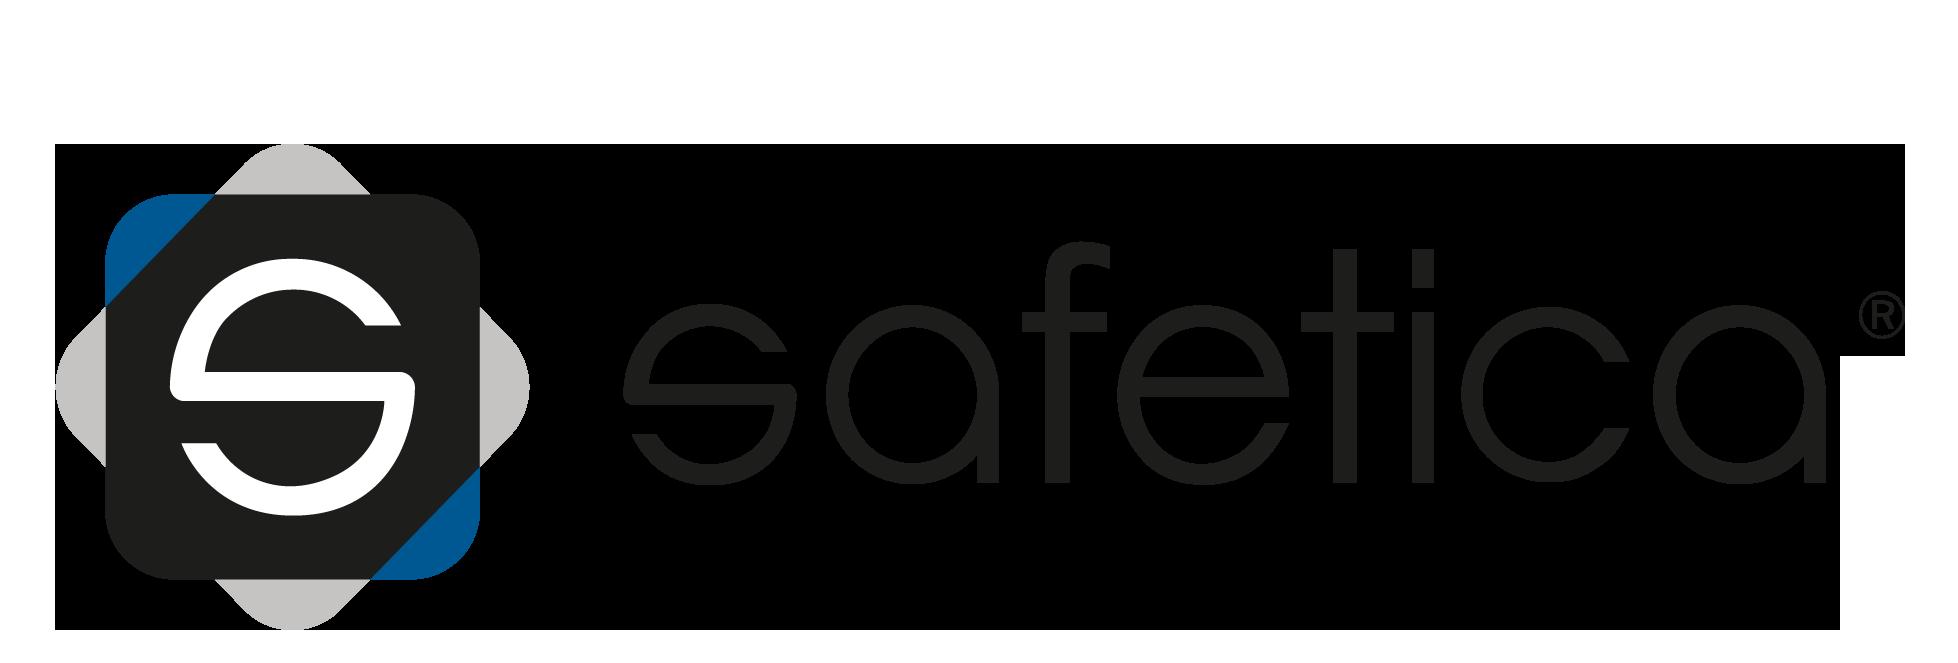 Safetica logo